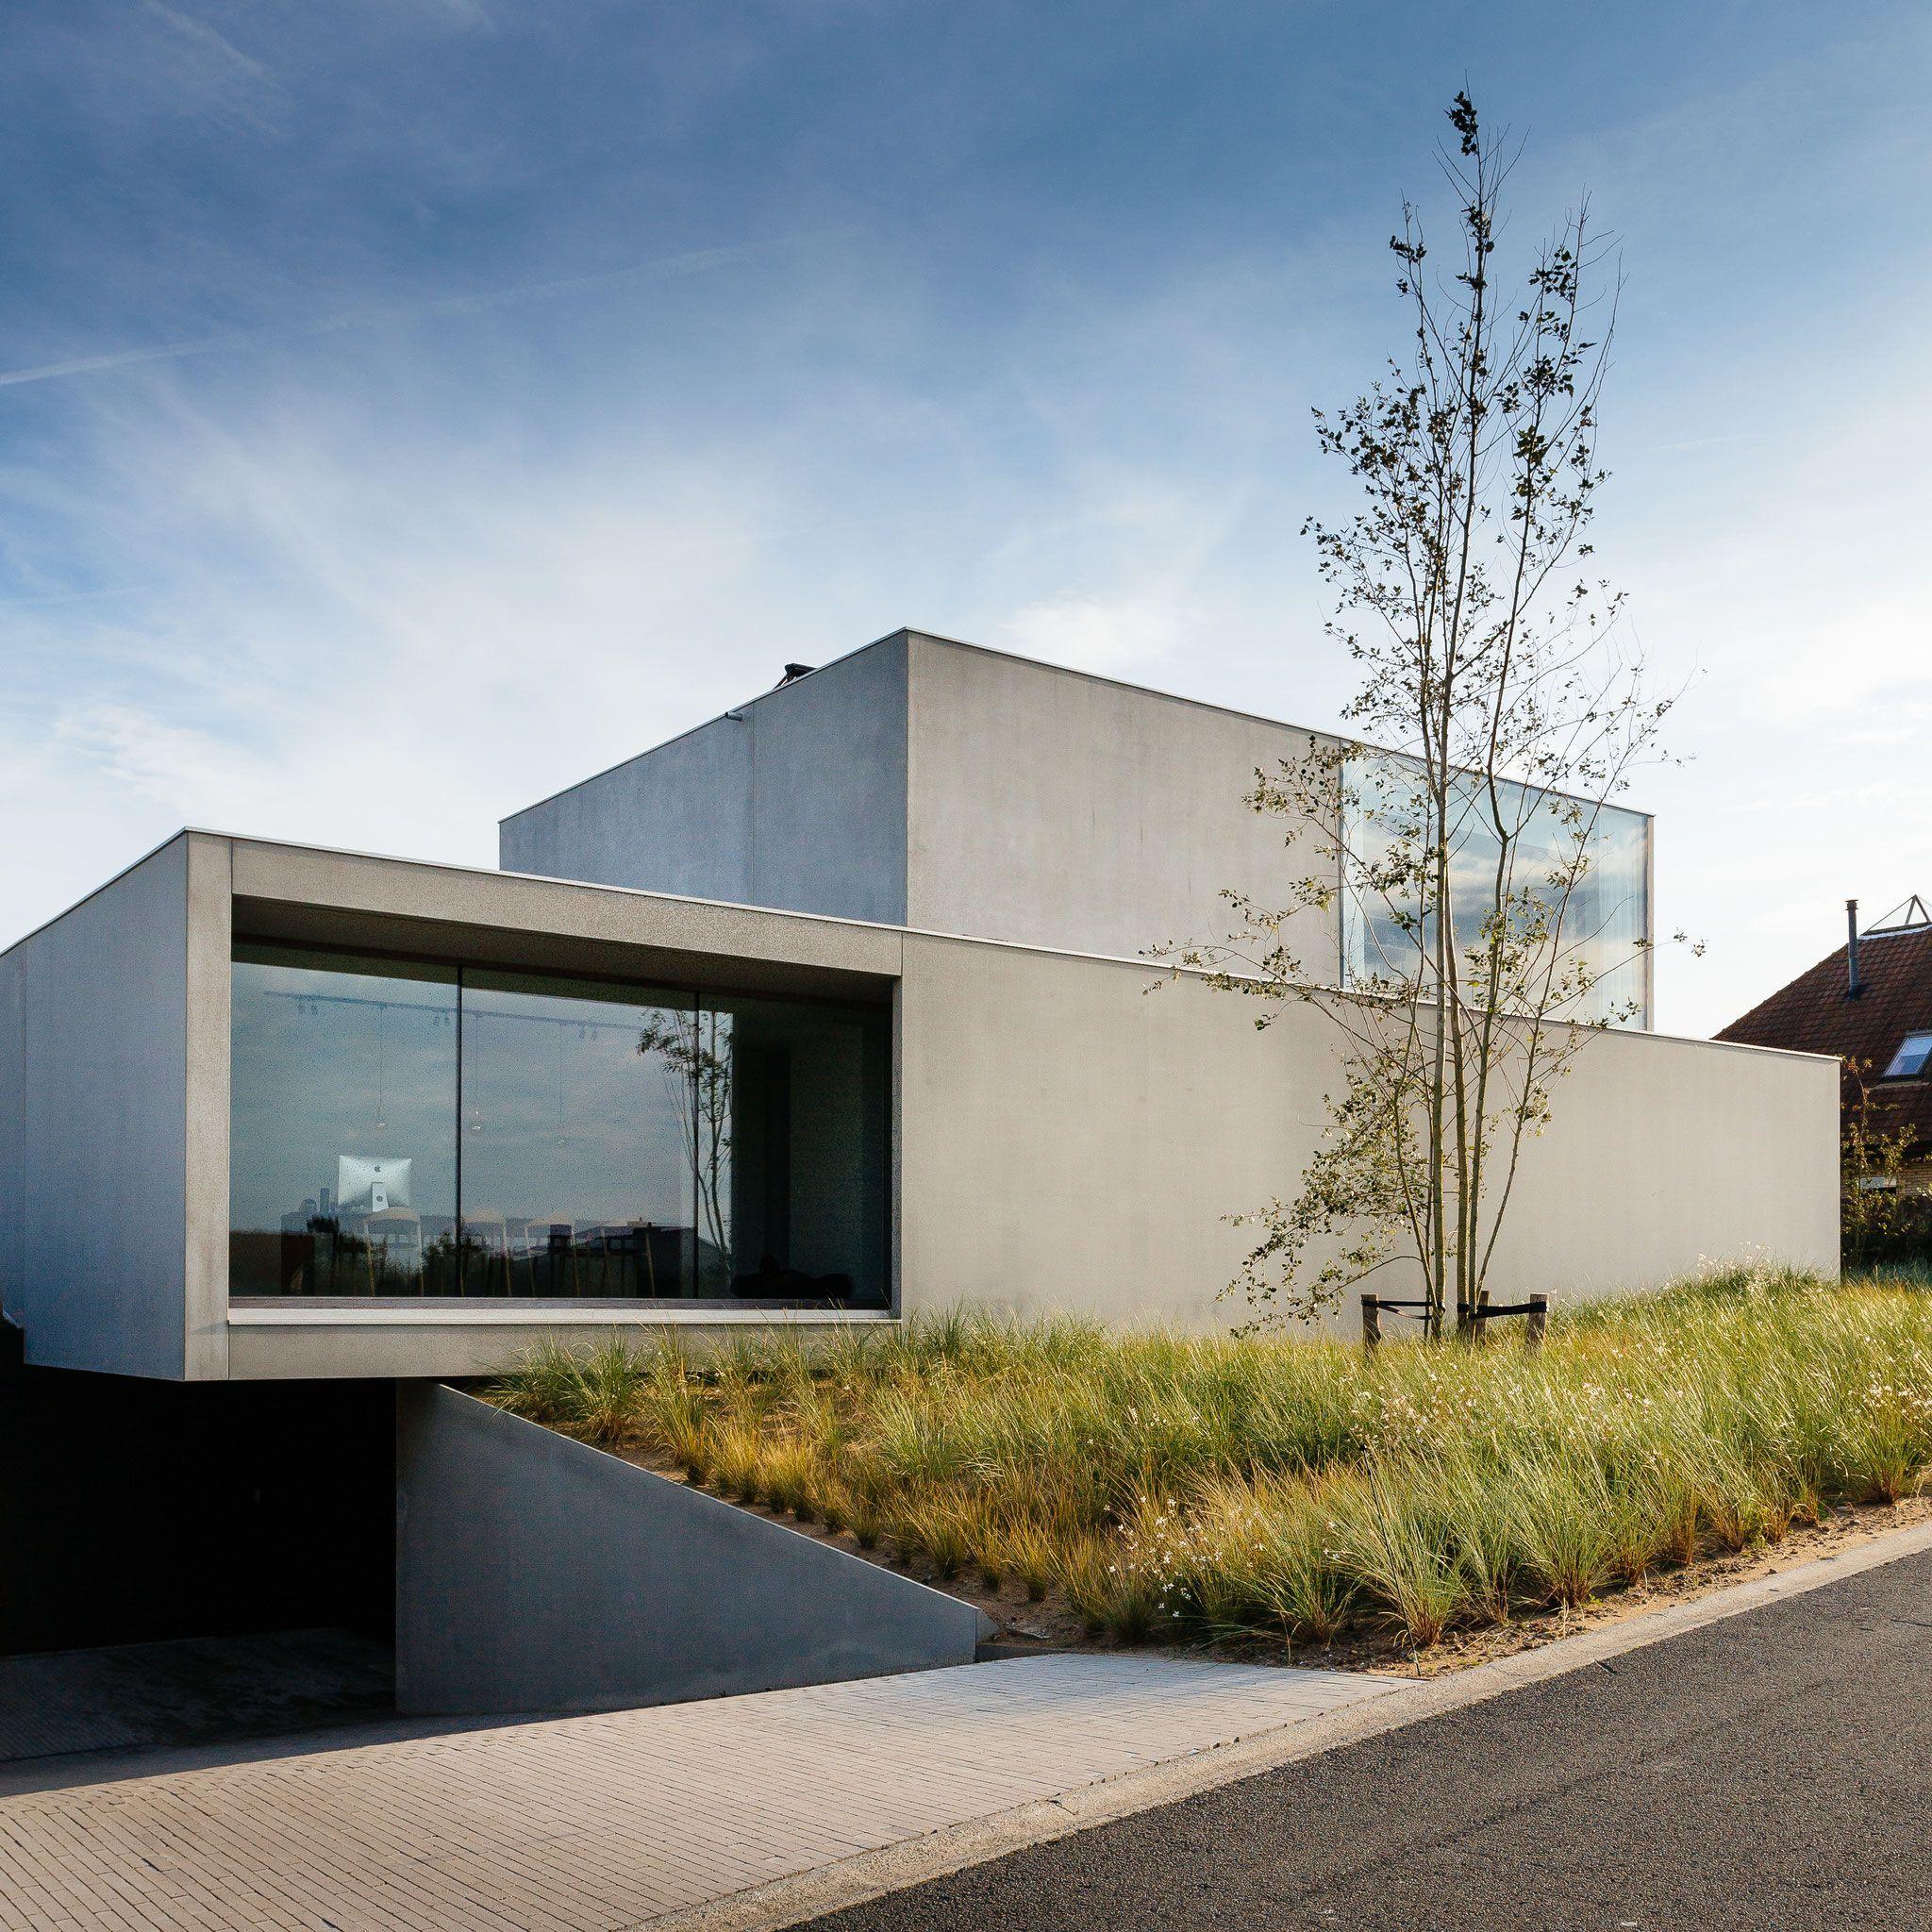 Schneller Hausbau, Modulbauweise, Fertighäuser aus Beton